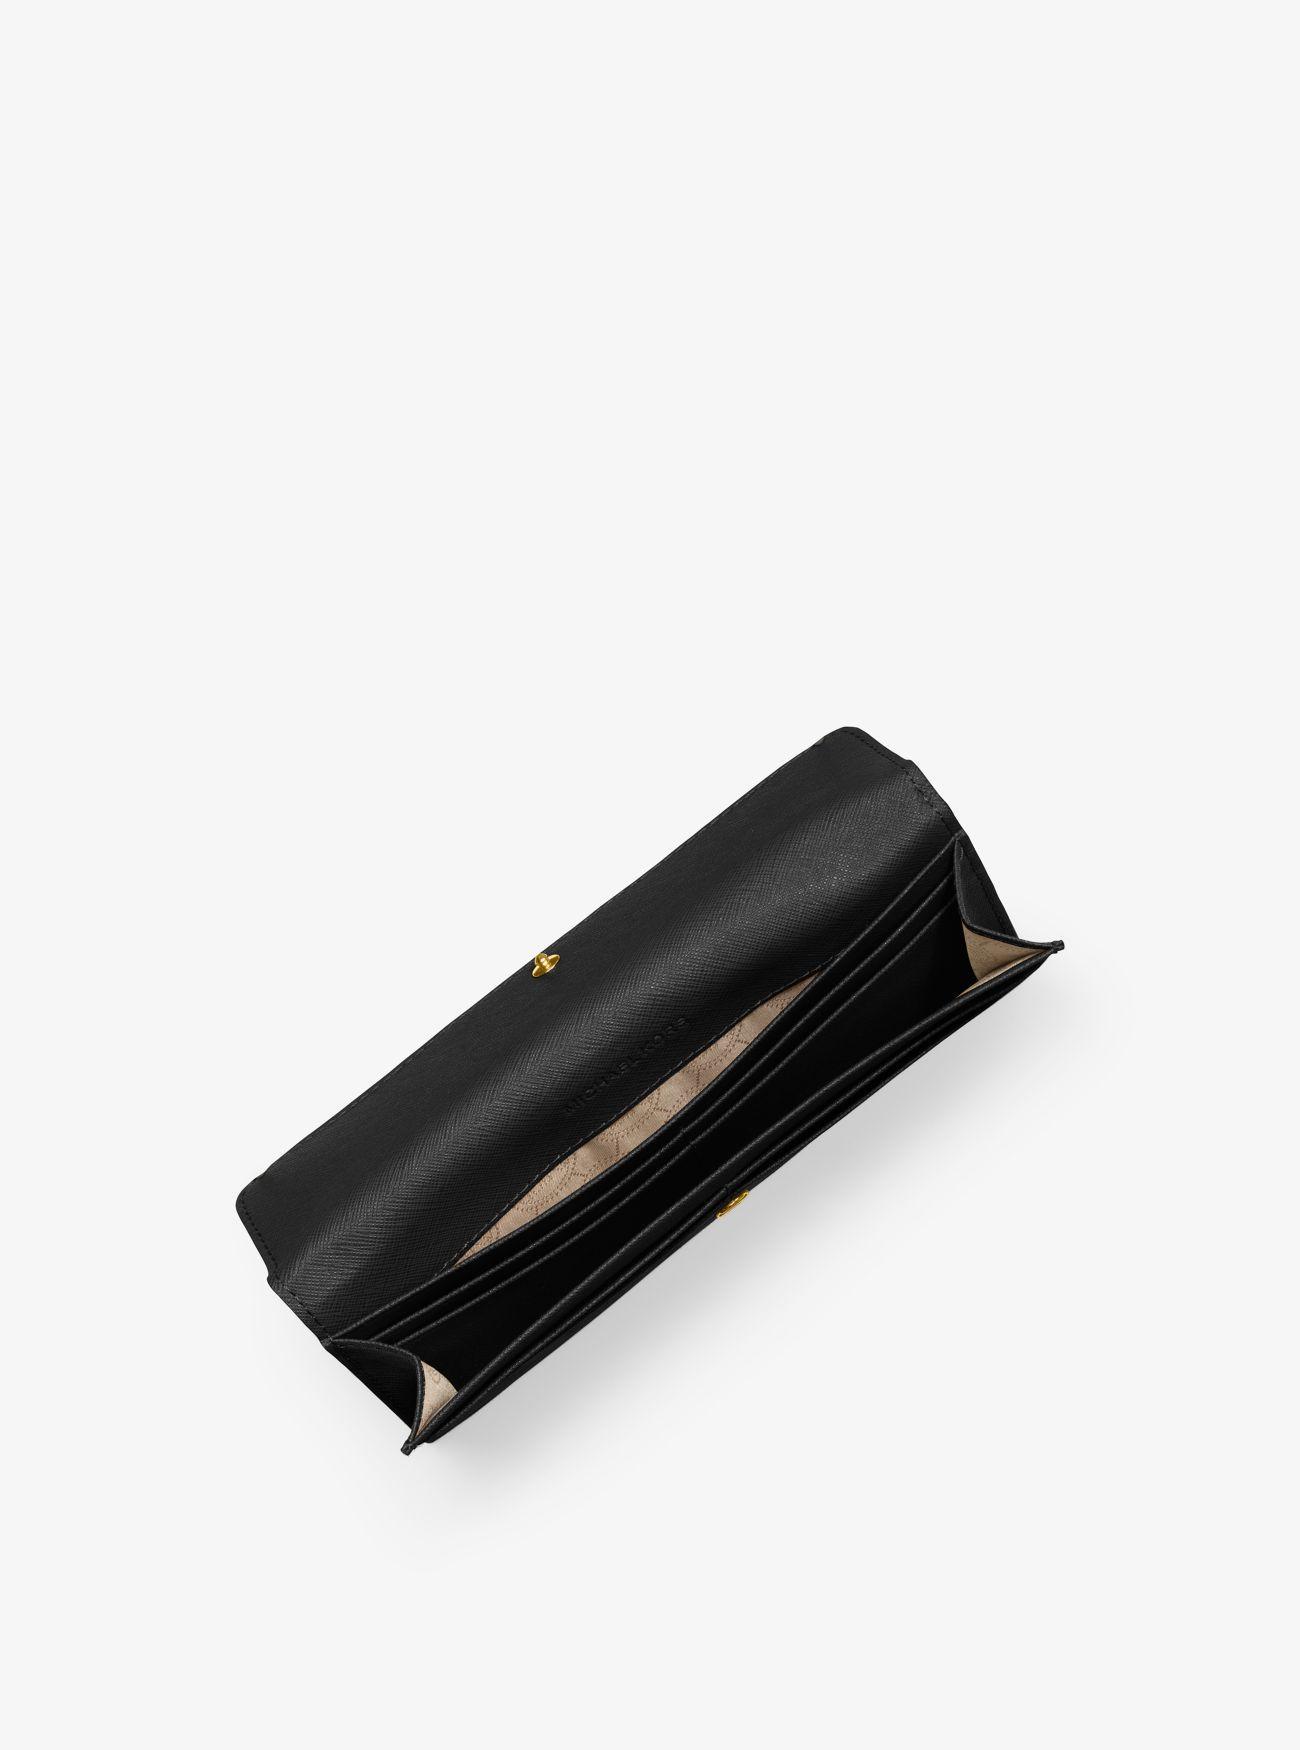 44f726d843e Michael Kors Travel Slim Saffiano Leather Wallet in Black - Lyst